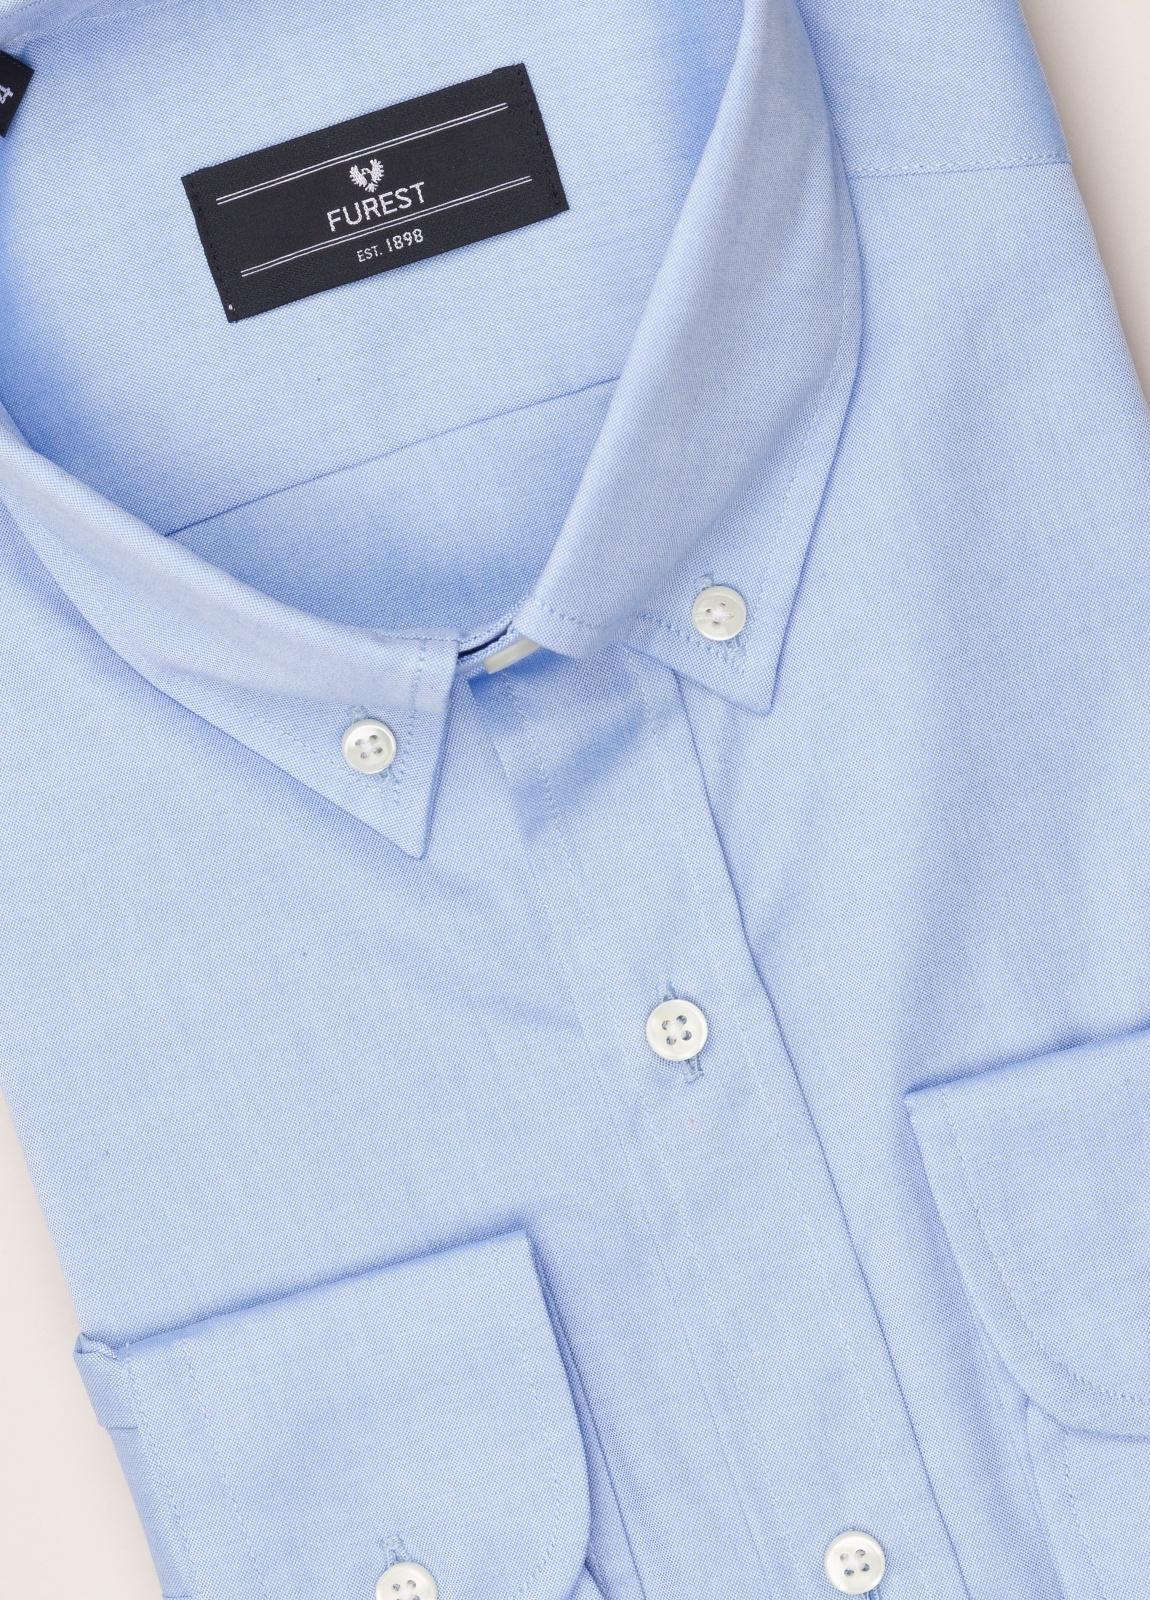 Camisa vestir FUREST COLECCIÓN REGULAR FIT cuello botón pin point celeste - Ítem2